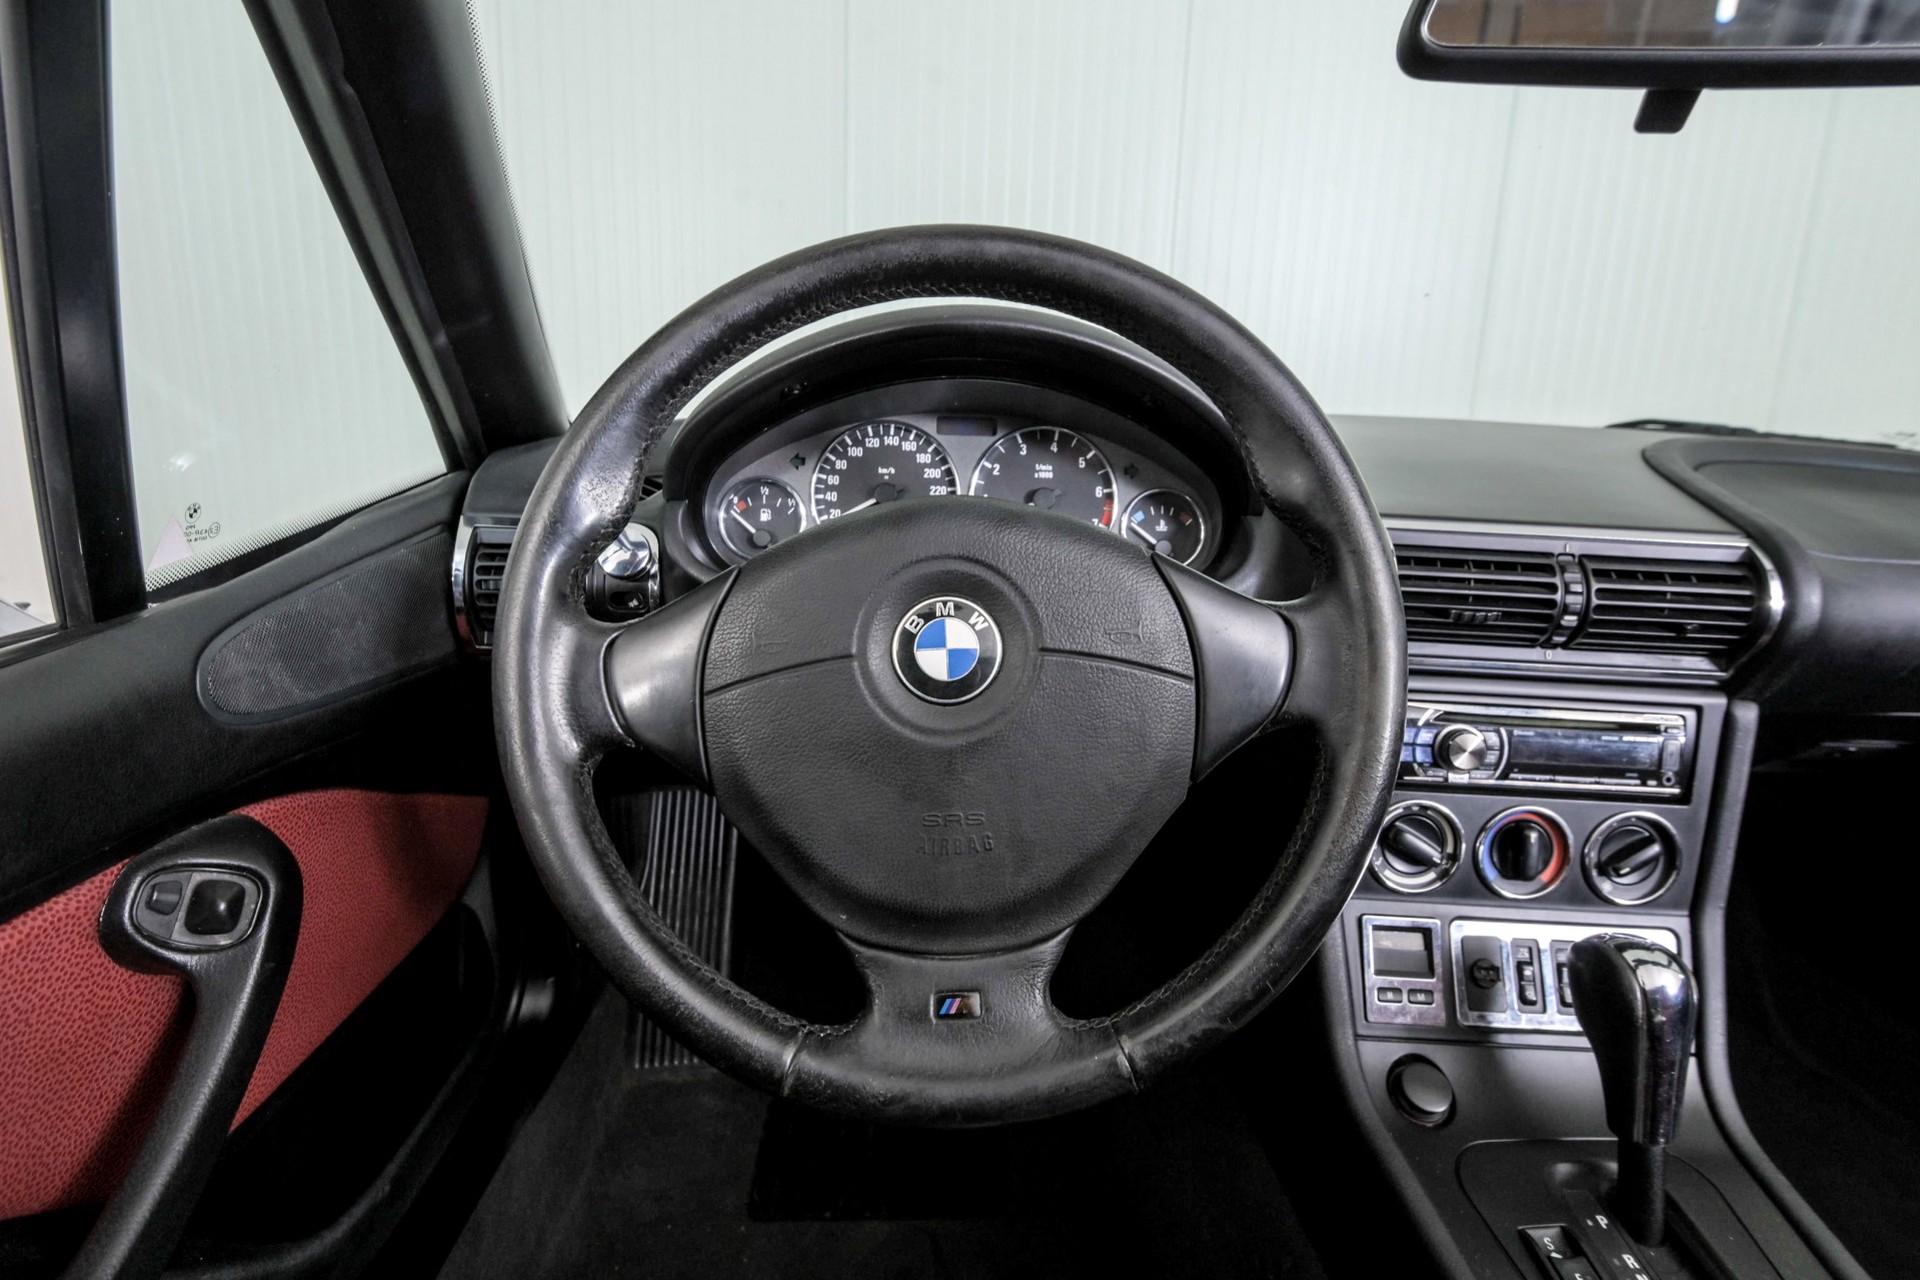 BMW Z3 Roadster 2.8 Foto 5